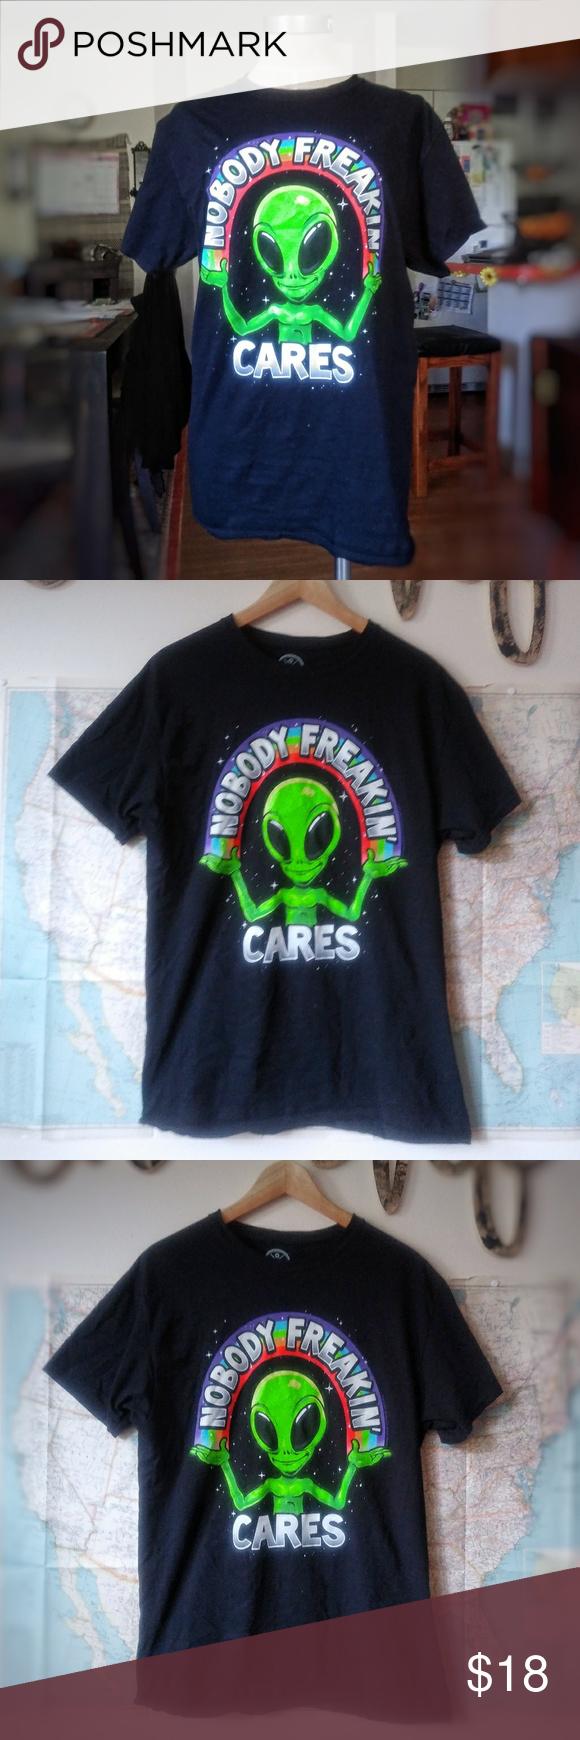 Gothic grunge alternative style alien graphic tee Beautiful neon green alien noalien